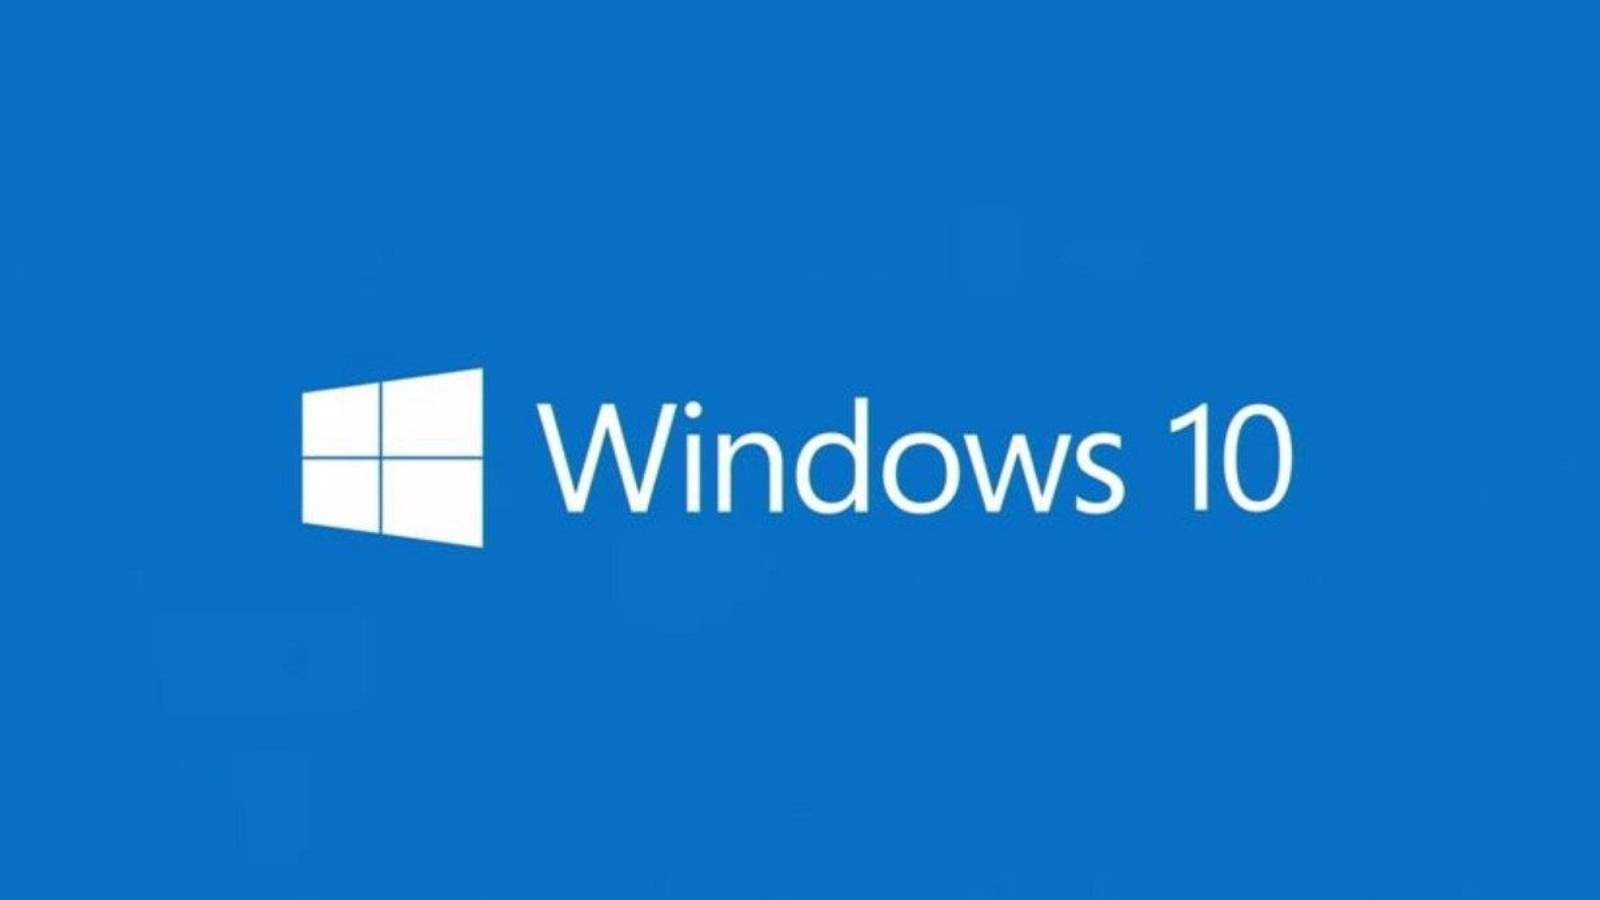 Windows 10 alternativa